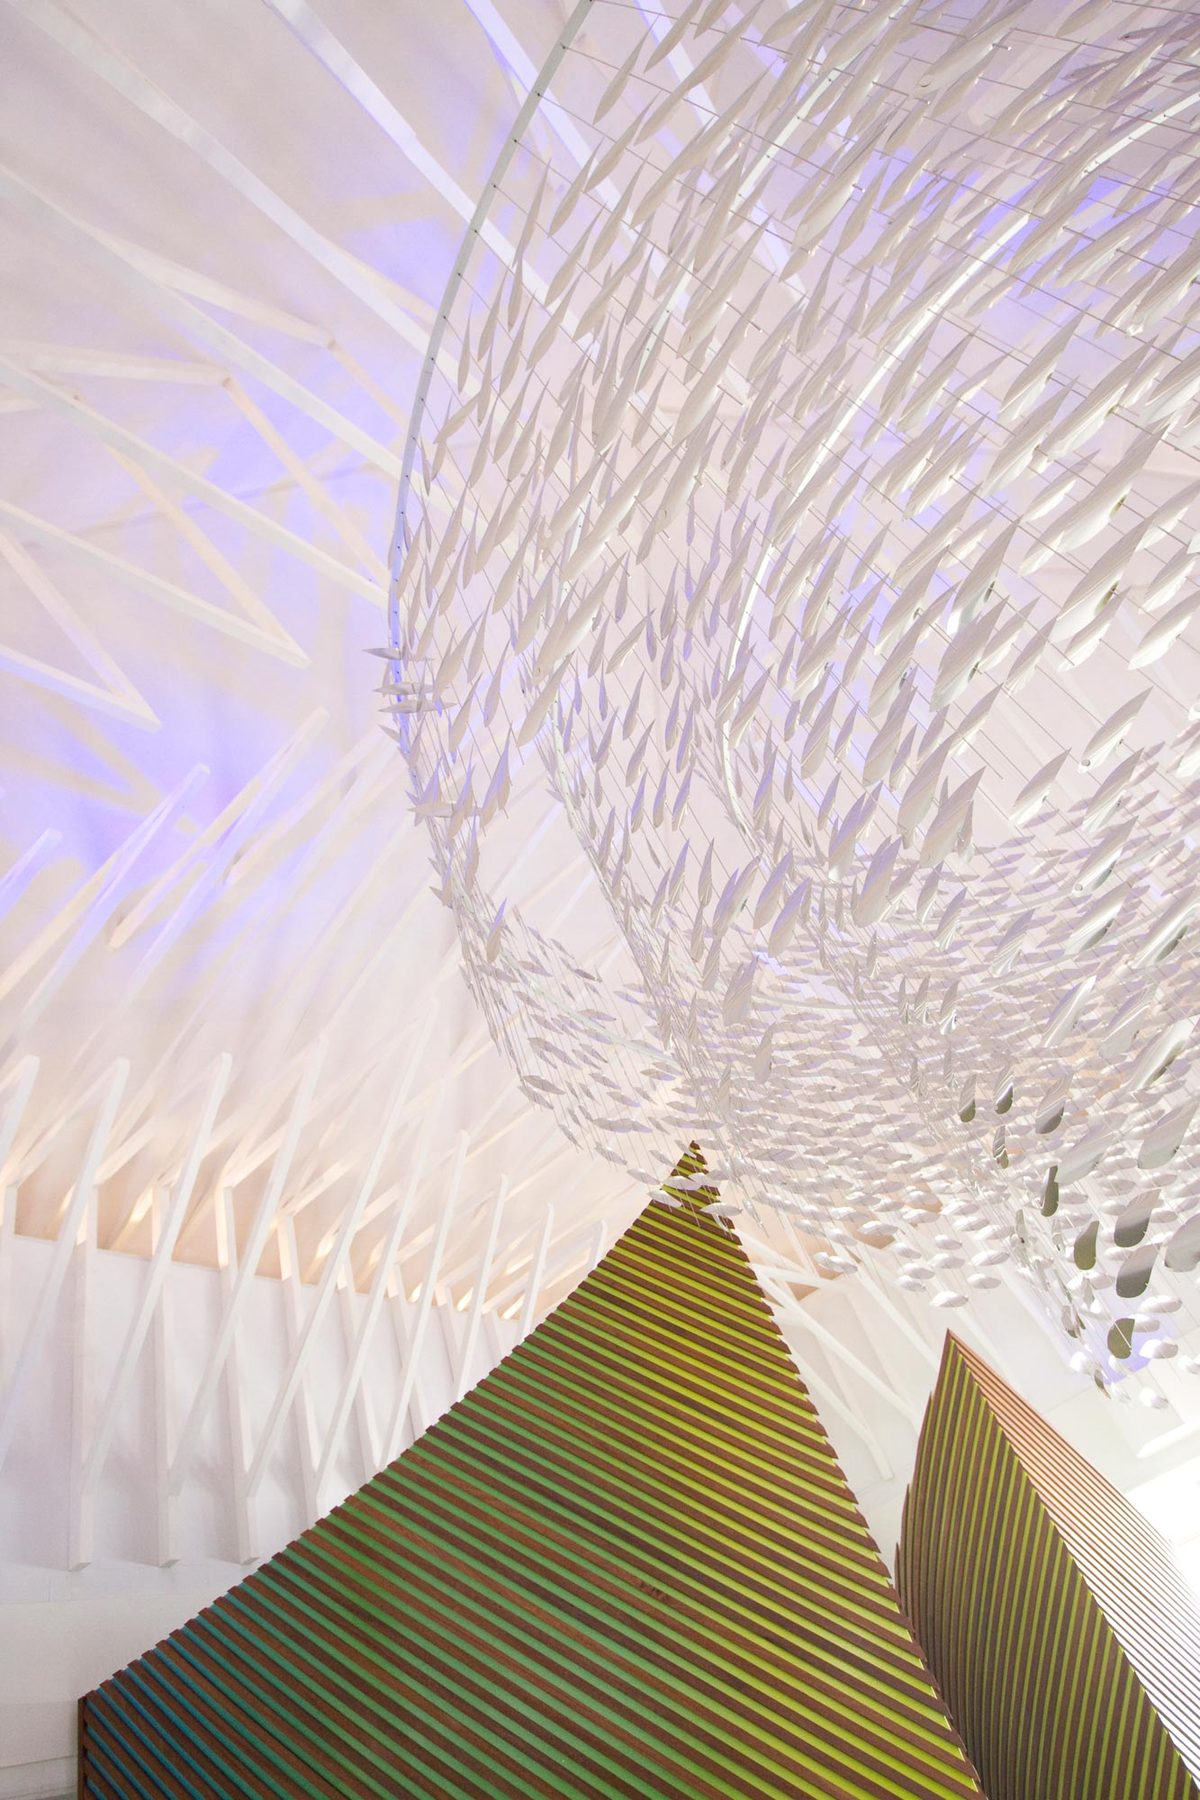 Sculptural shoal